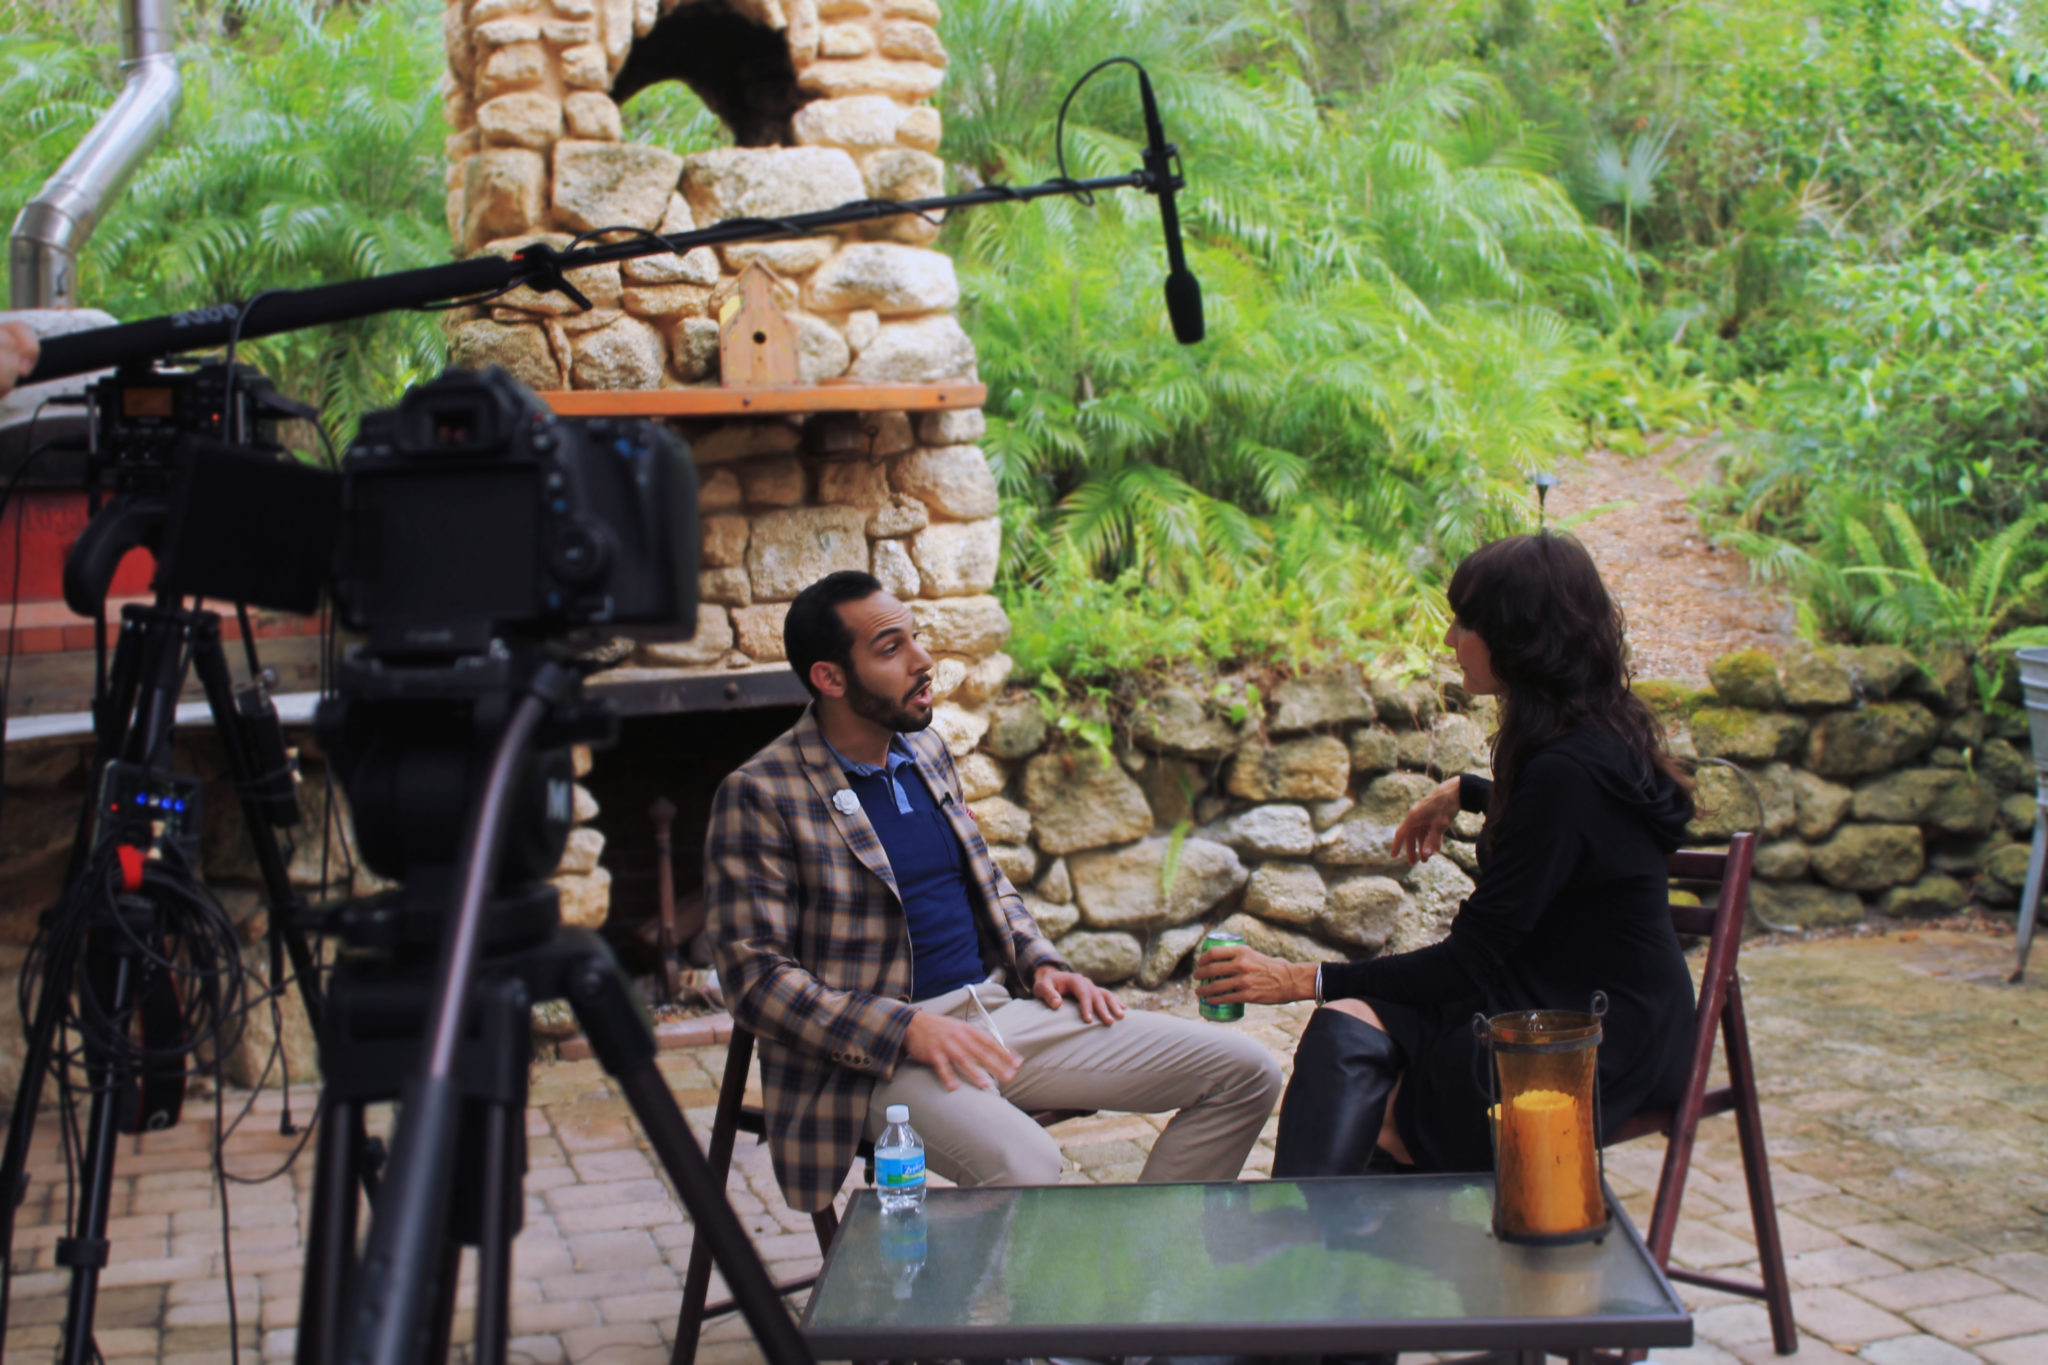 Inspire and evoke change says entrepreneur Omar Khateeb